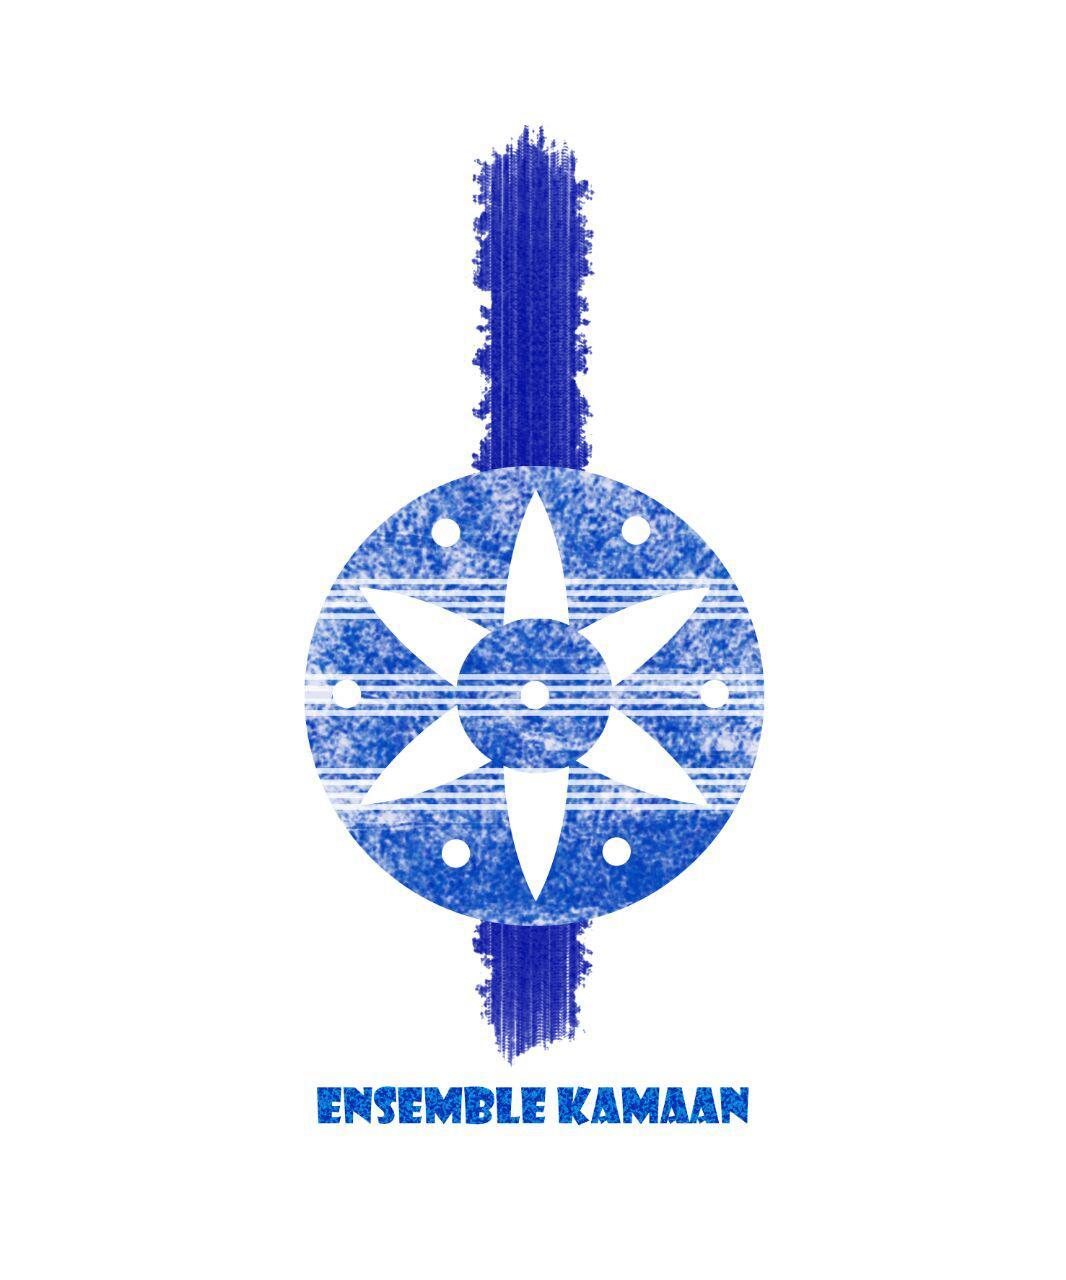 kamaan logo